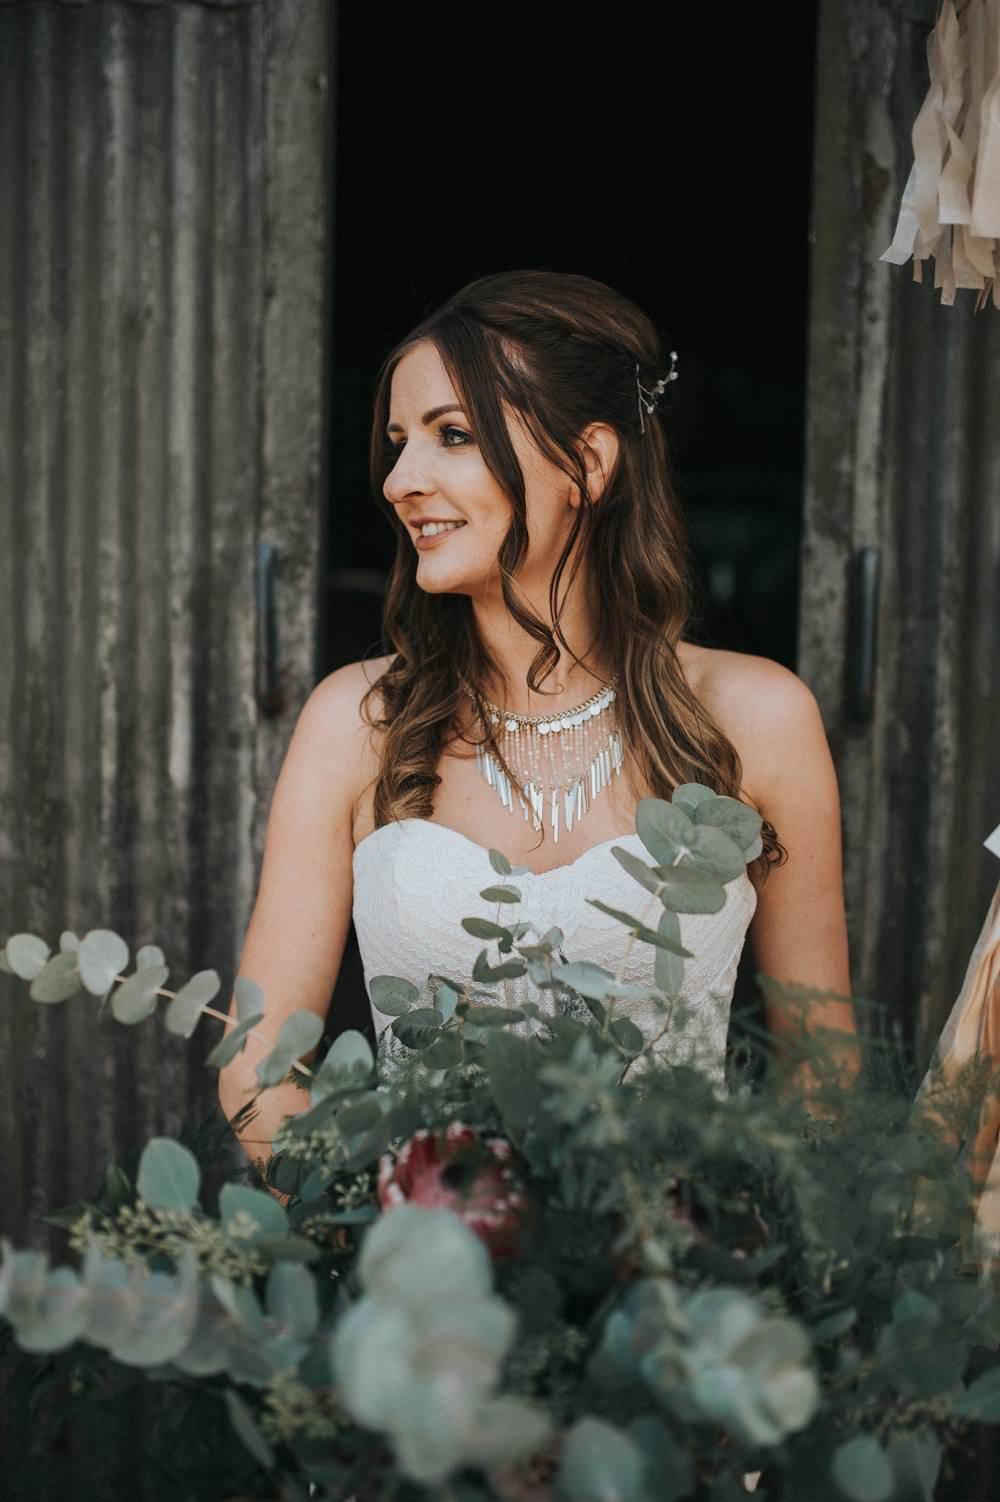 Hair Make Up Foliage Bouquet Bride Bridal Flowers Large Wild Eucalyptus Boho Greenery Barn Wedding Kerry Diamond Photography